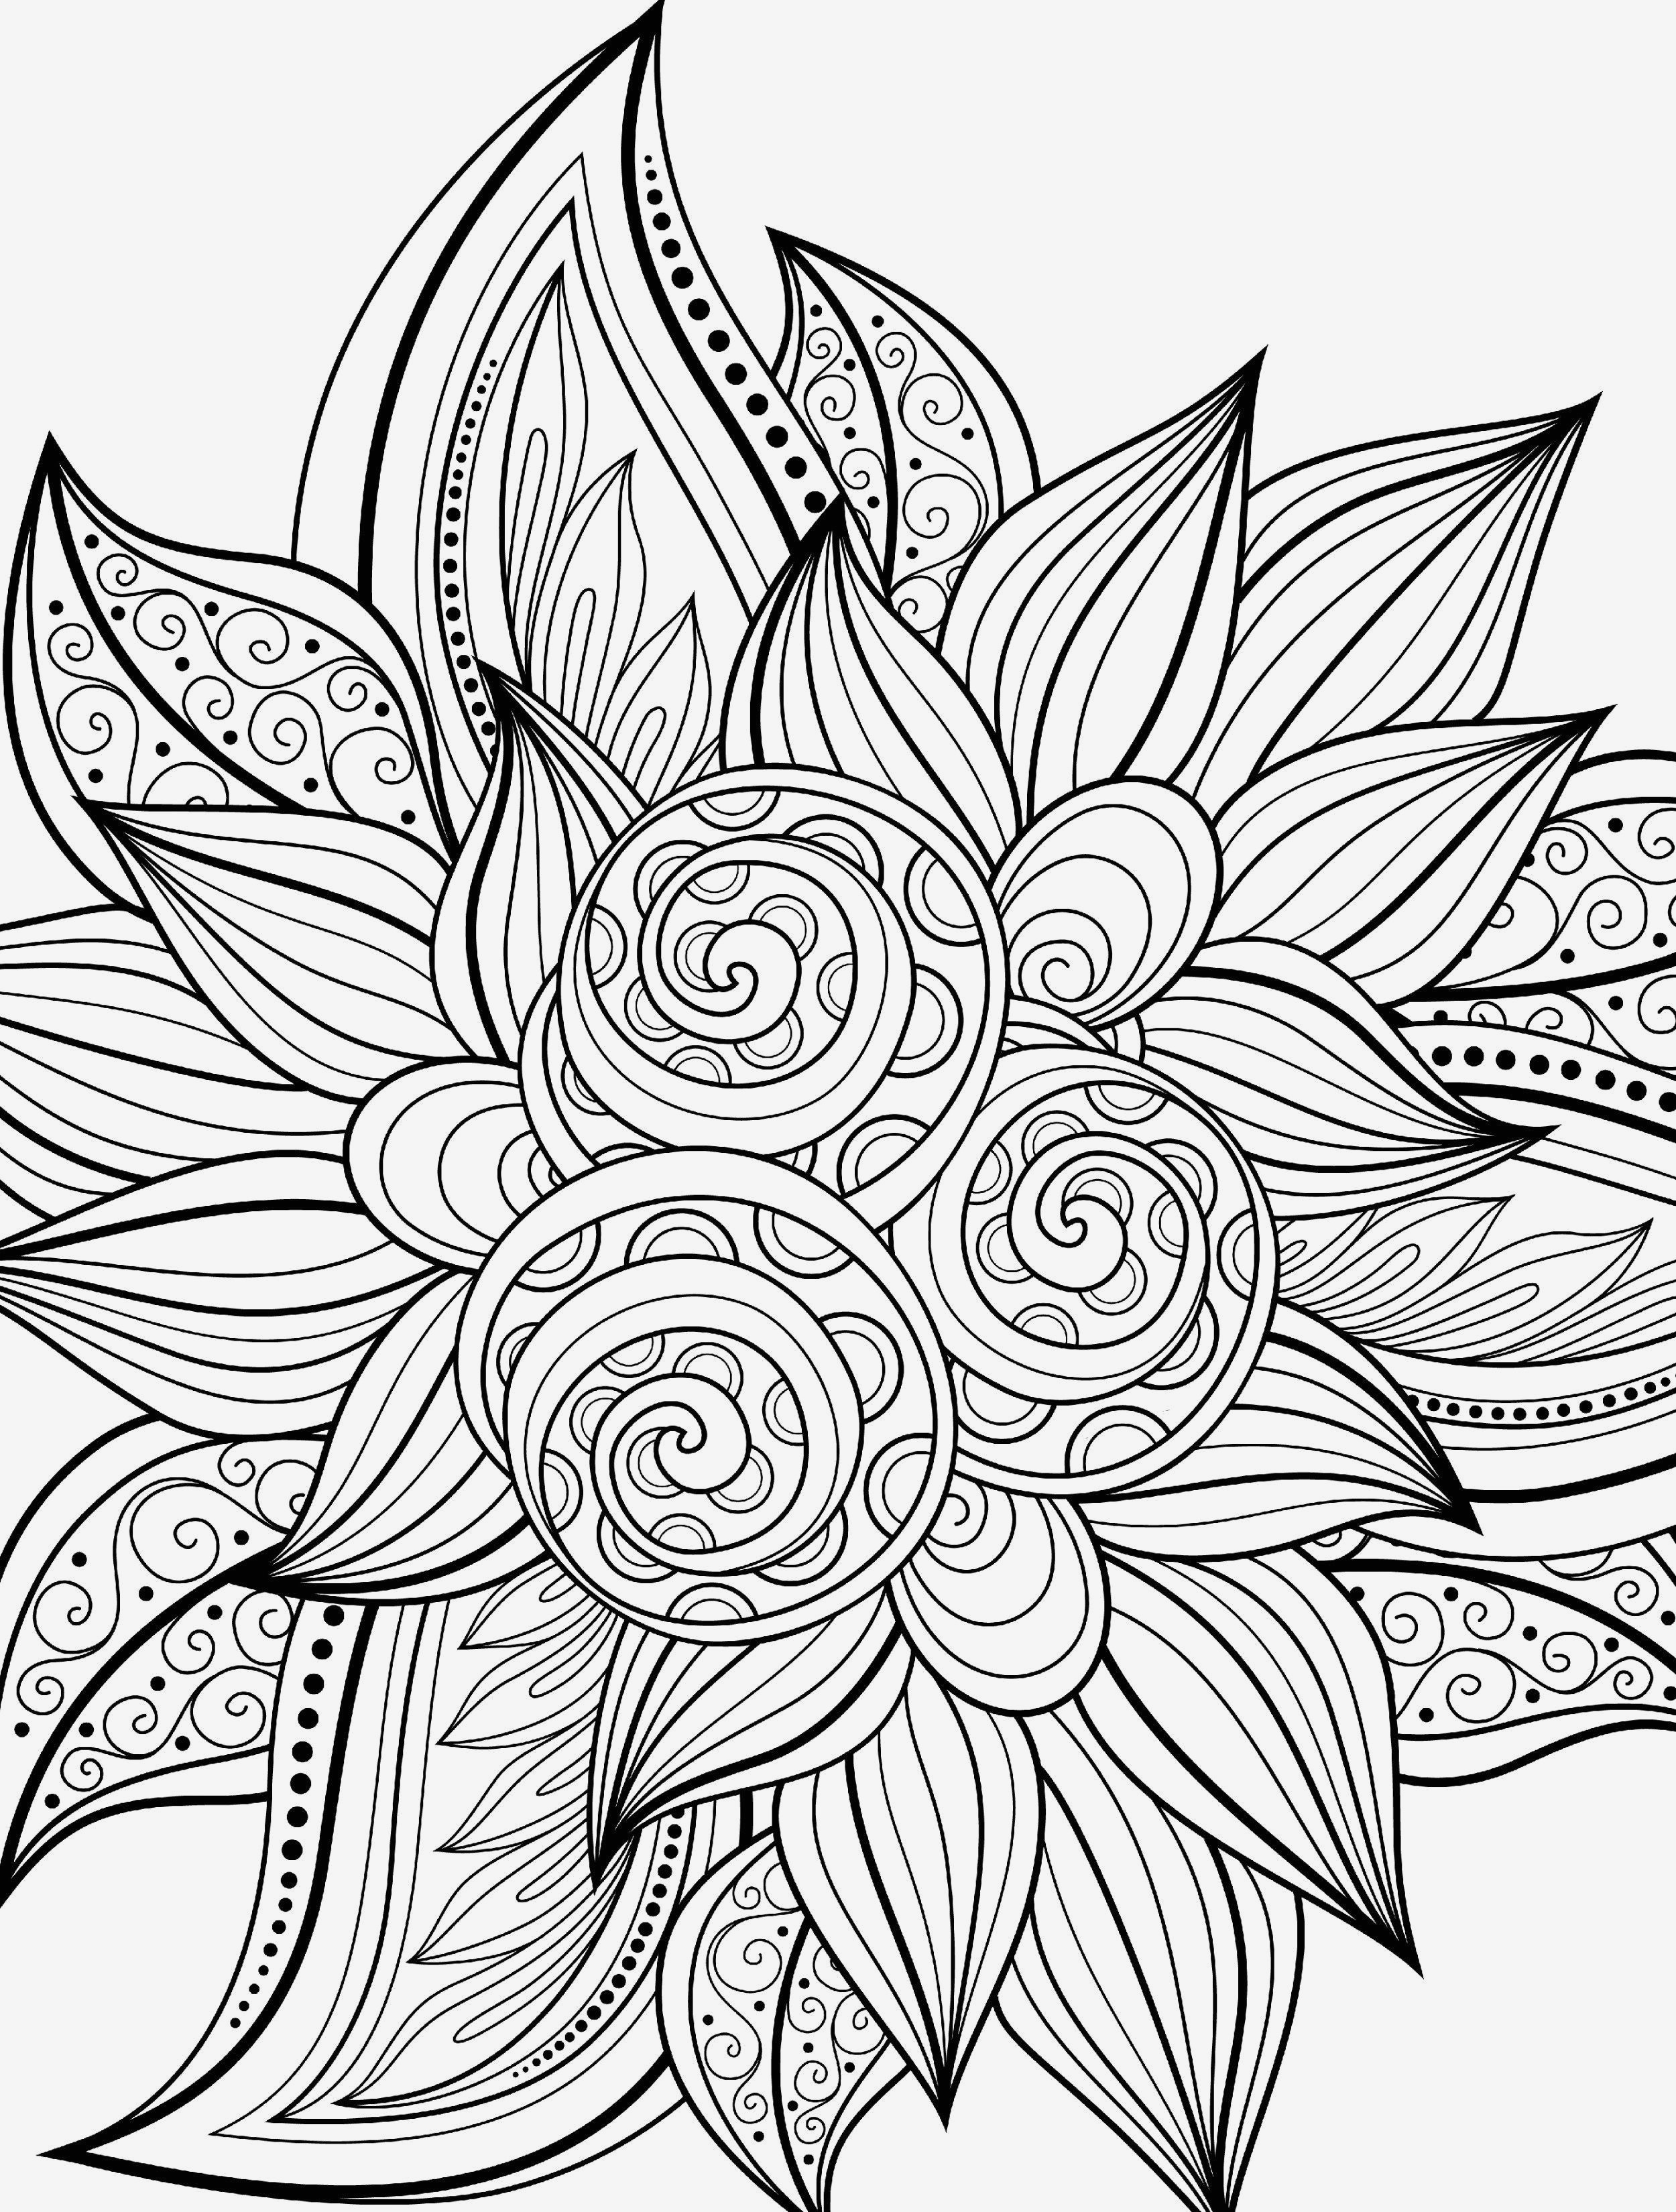 custom photo flower vase of free flower coloring pages the first ever custom cool vases flower inside free flower coloring pages free print flower coloring pages free printable fresh cool vases flower vase